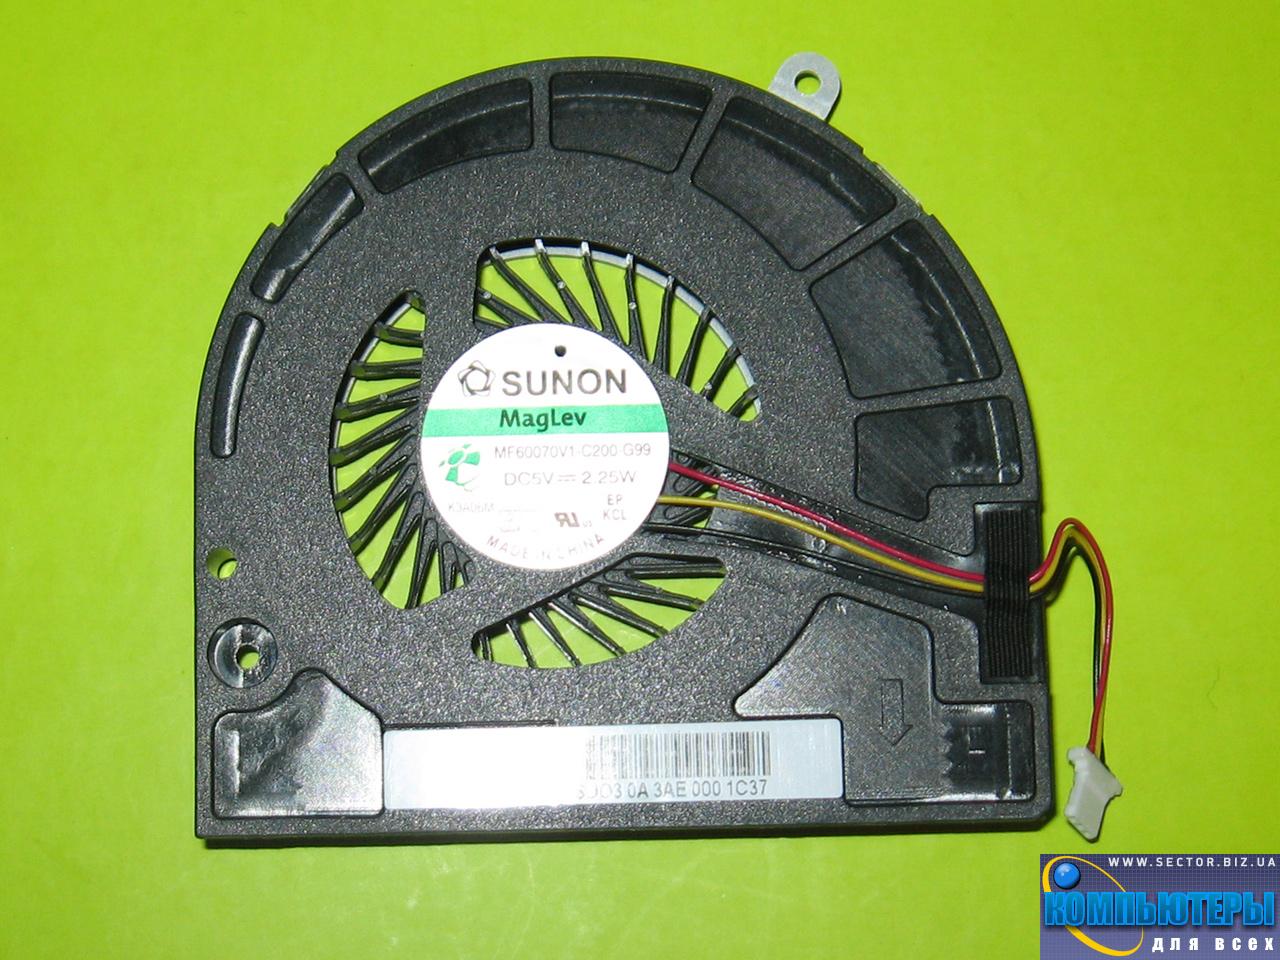 Кулер к ноутбуку Acer Aspire E1-530 E1-530G E1-570 E1-570G p/n: MF60070V1-C200-G99. Фото № 1.